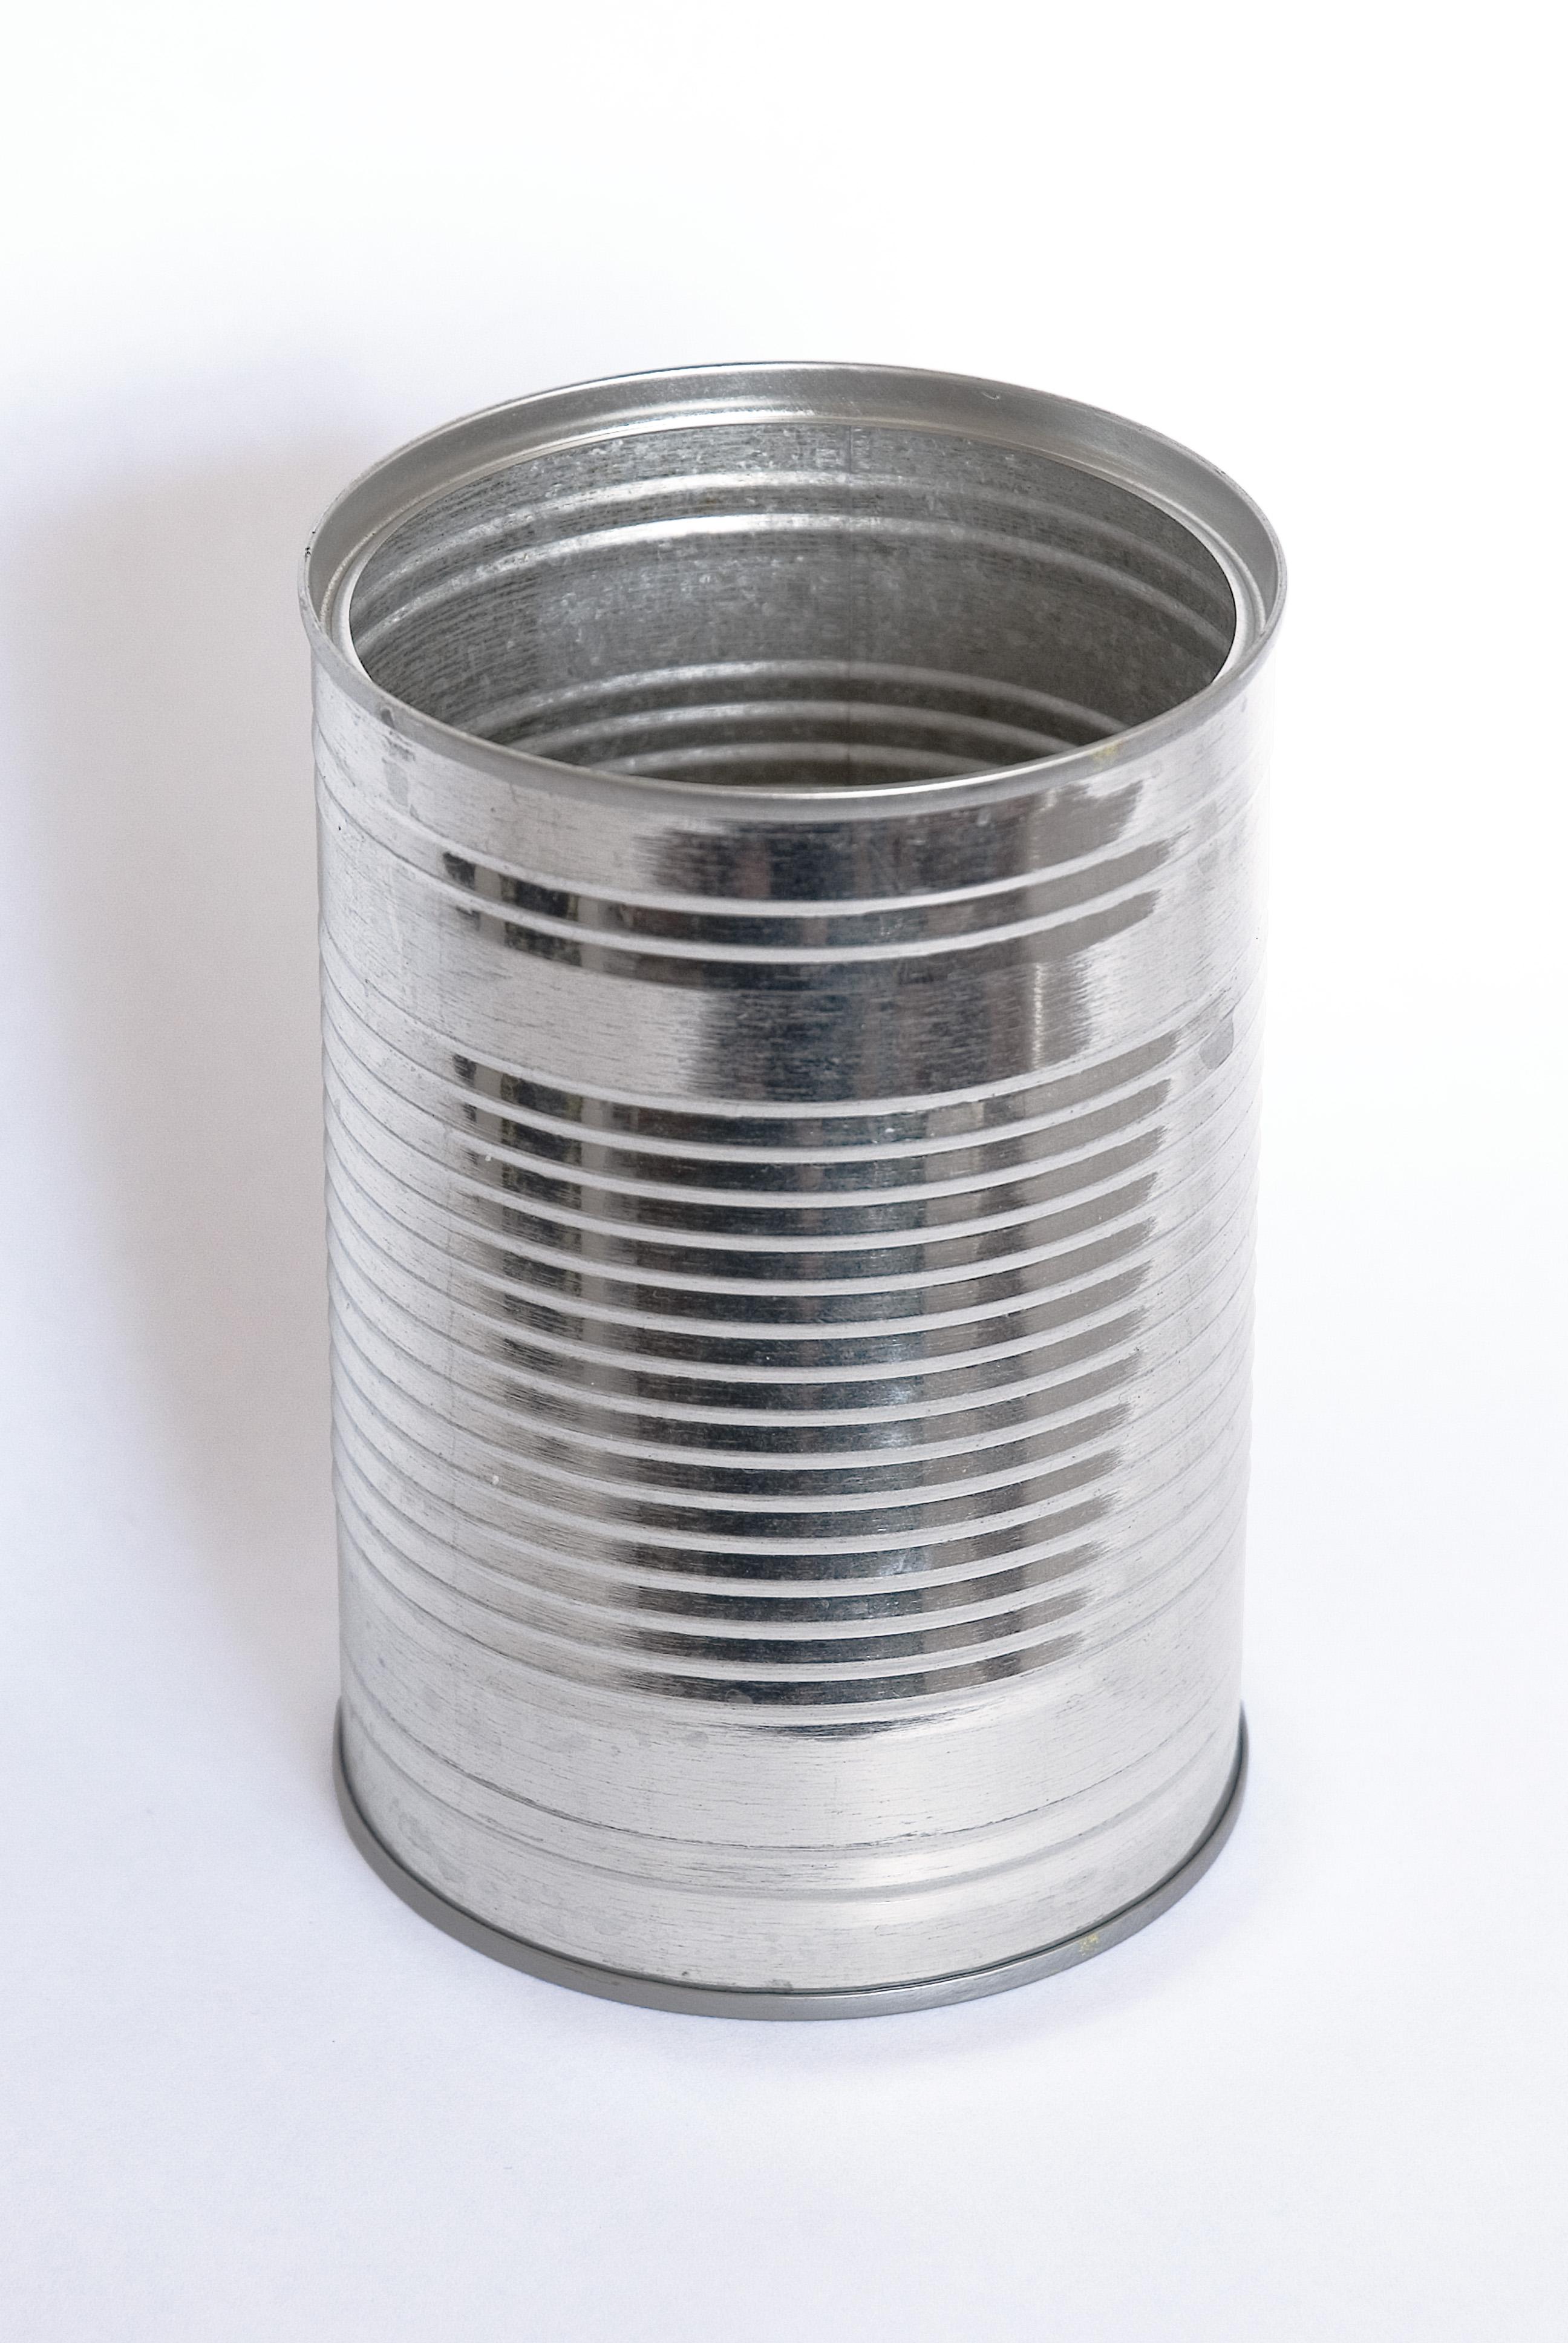 Wholesale Metal Food Cans